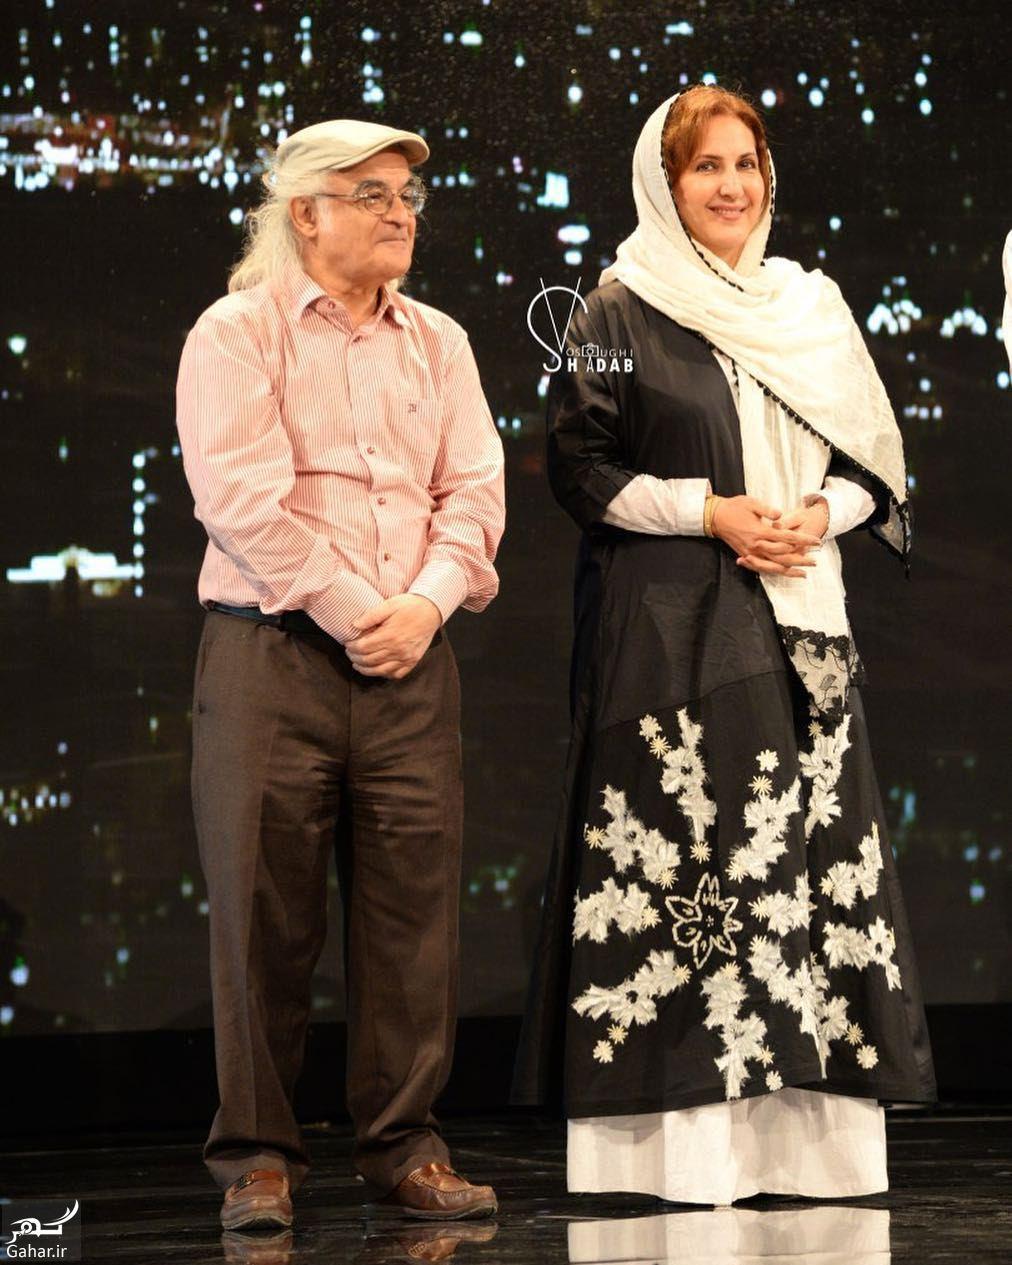 901463 Gahar ir اختتامیه ششمین جشنواره فیلم شهر / عکس